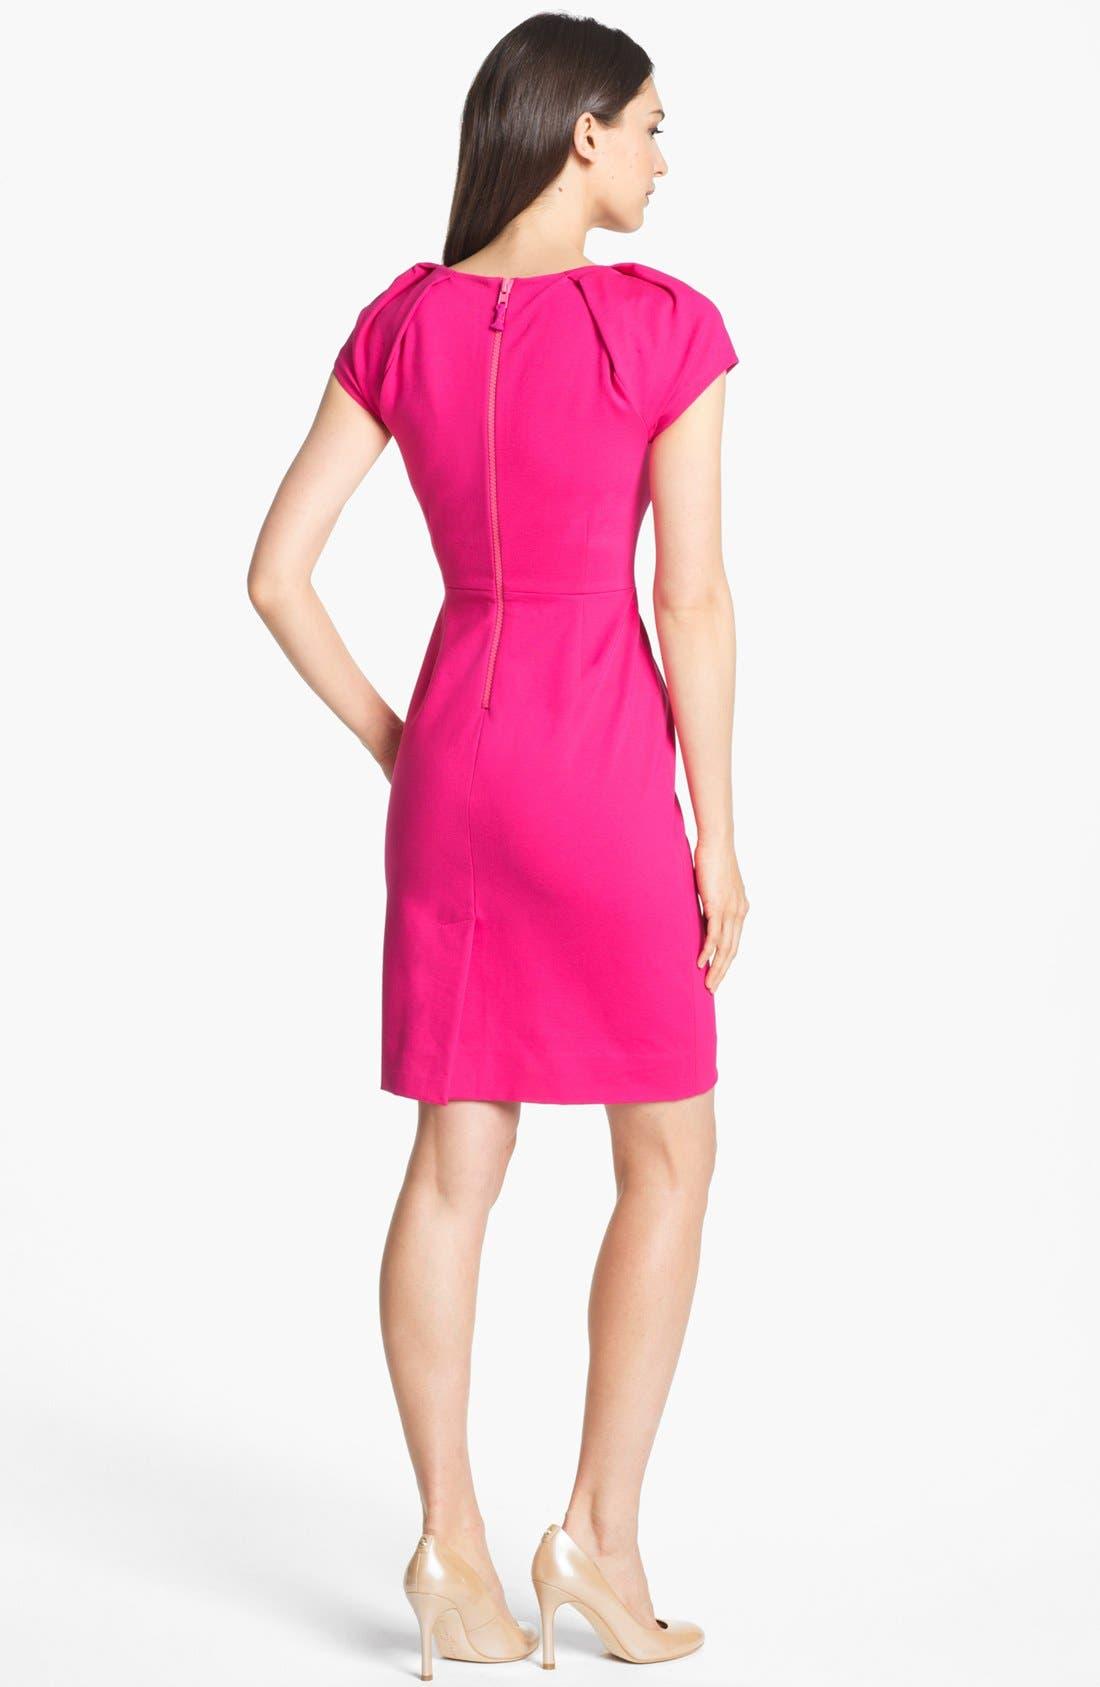 Alternate Image 2  - kate spade new york 'ivie' stretch sheath dress (Online Only)